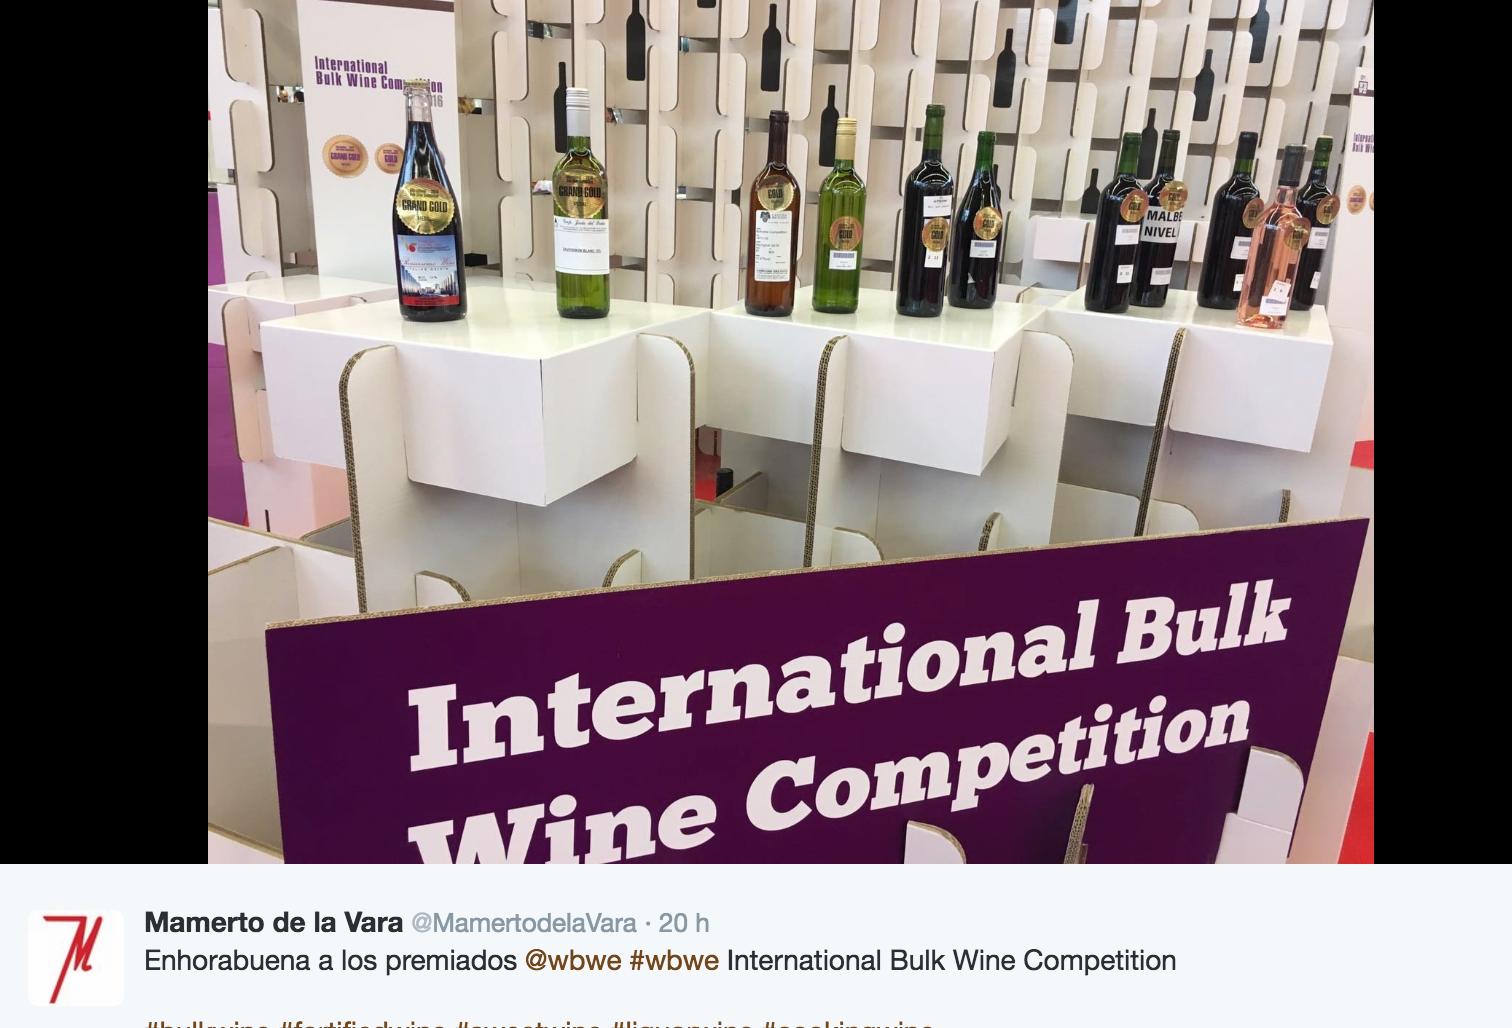 world bulk wine exhibition 2016 modular cardboard design stand para feria de vino